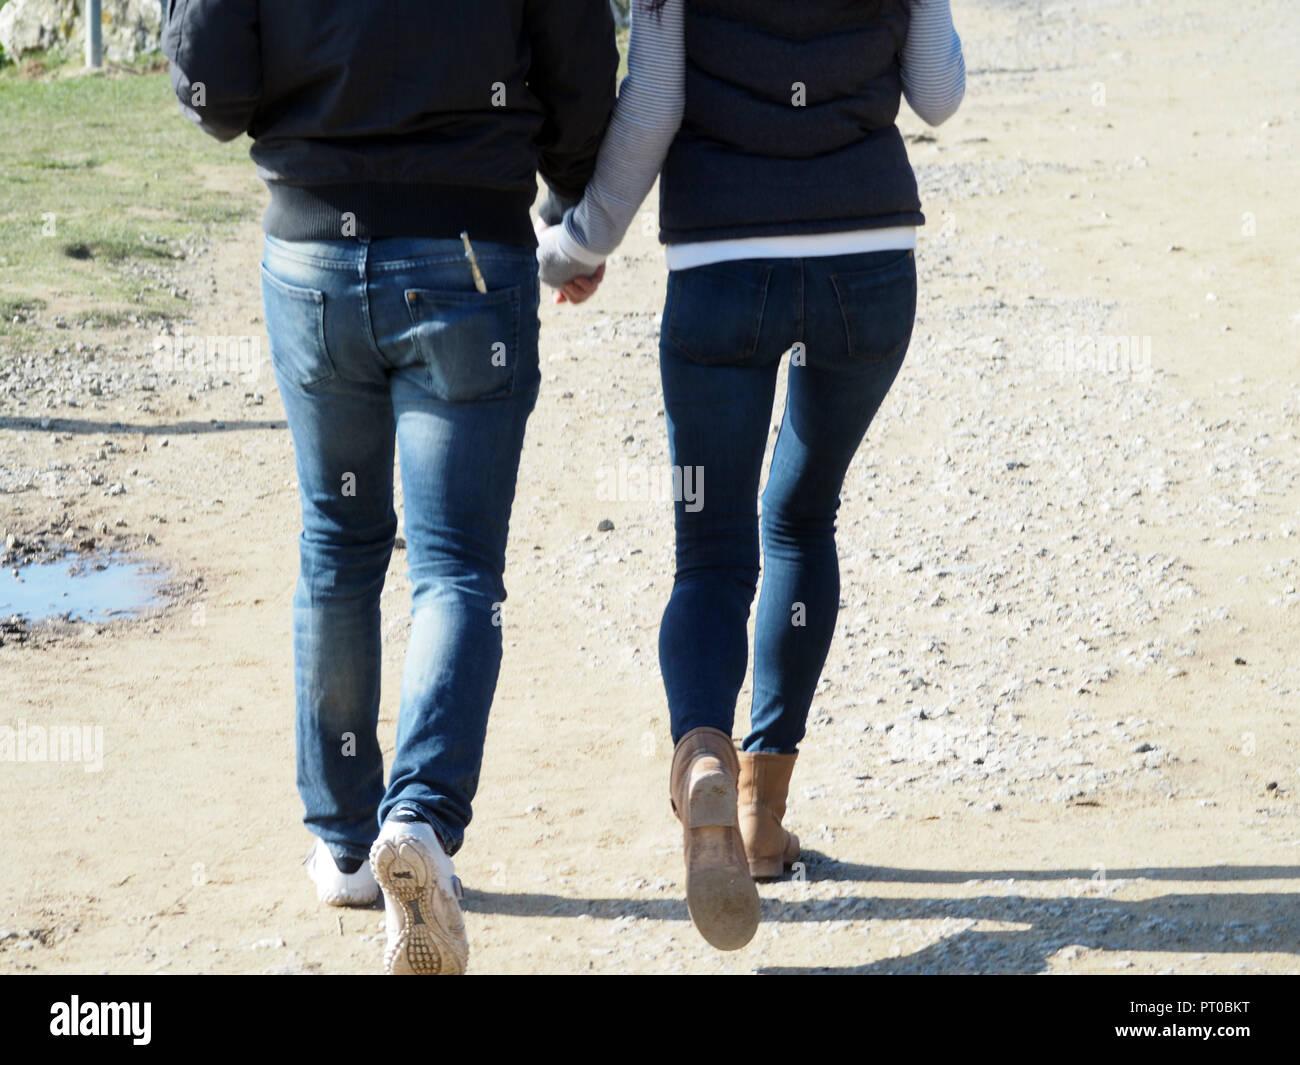 Couple Twenties rear view walking, - Stock Image